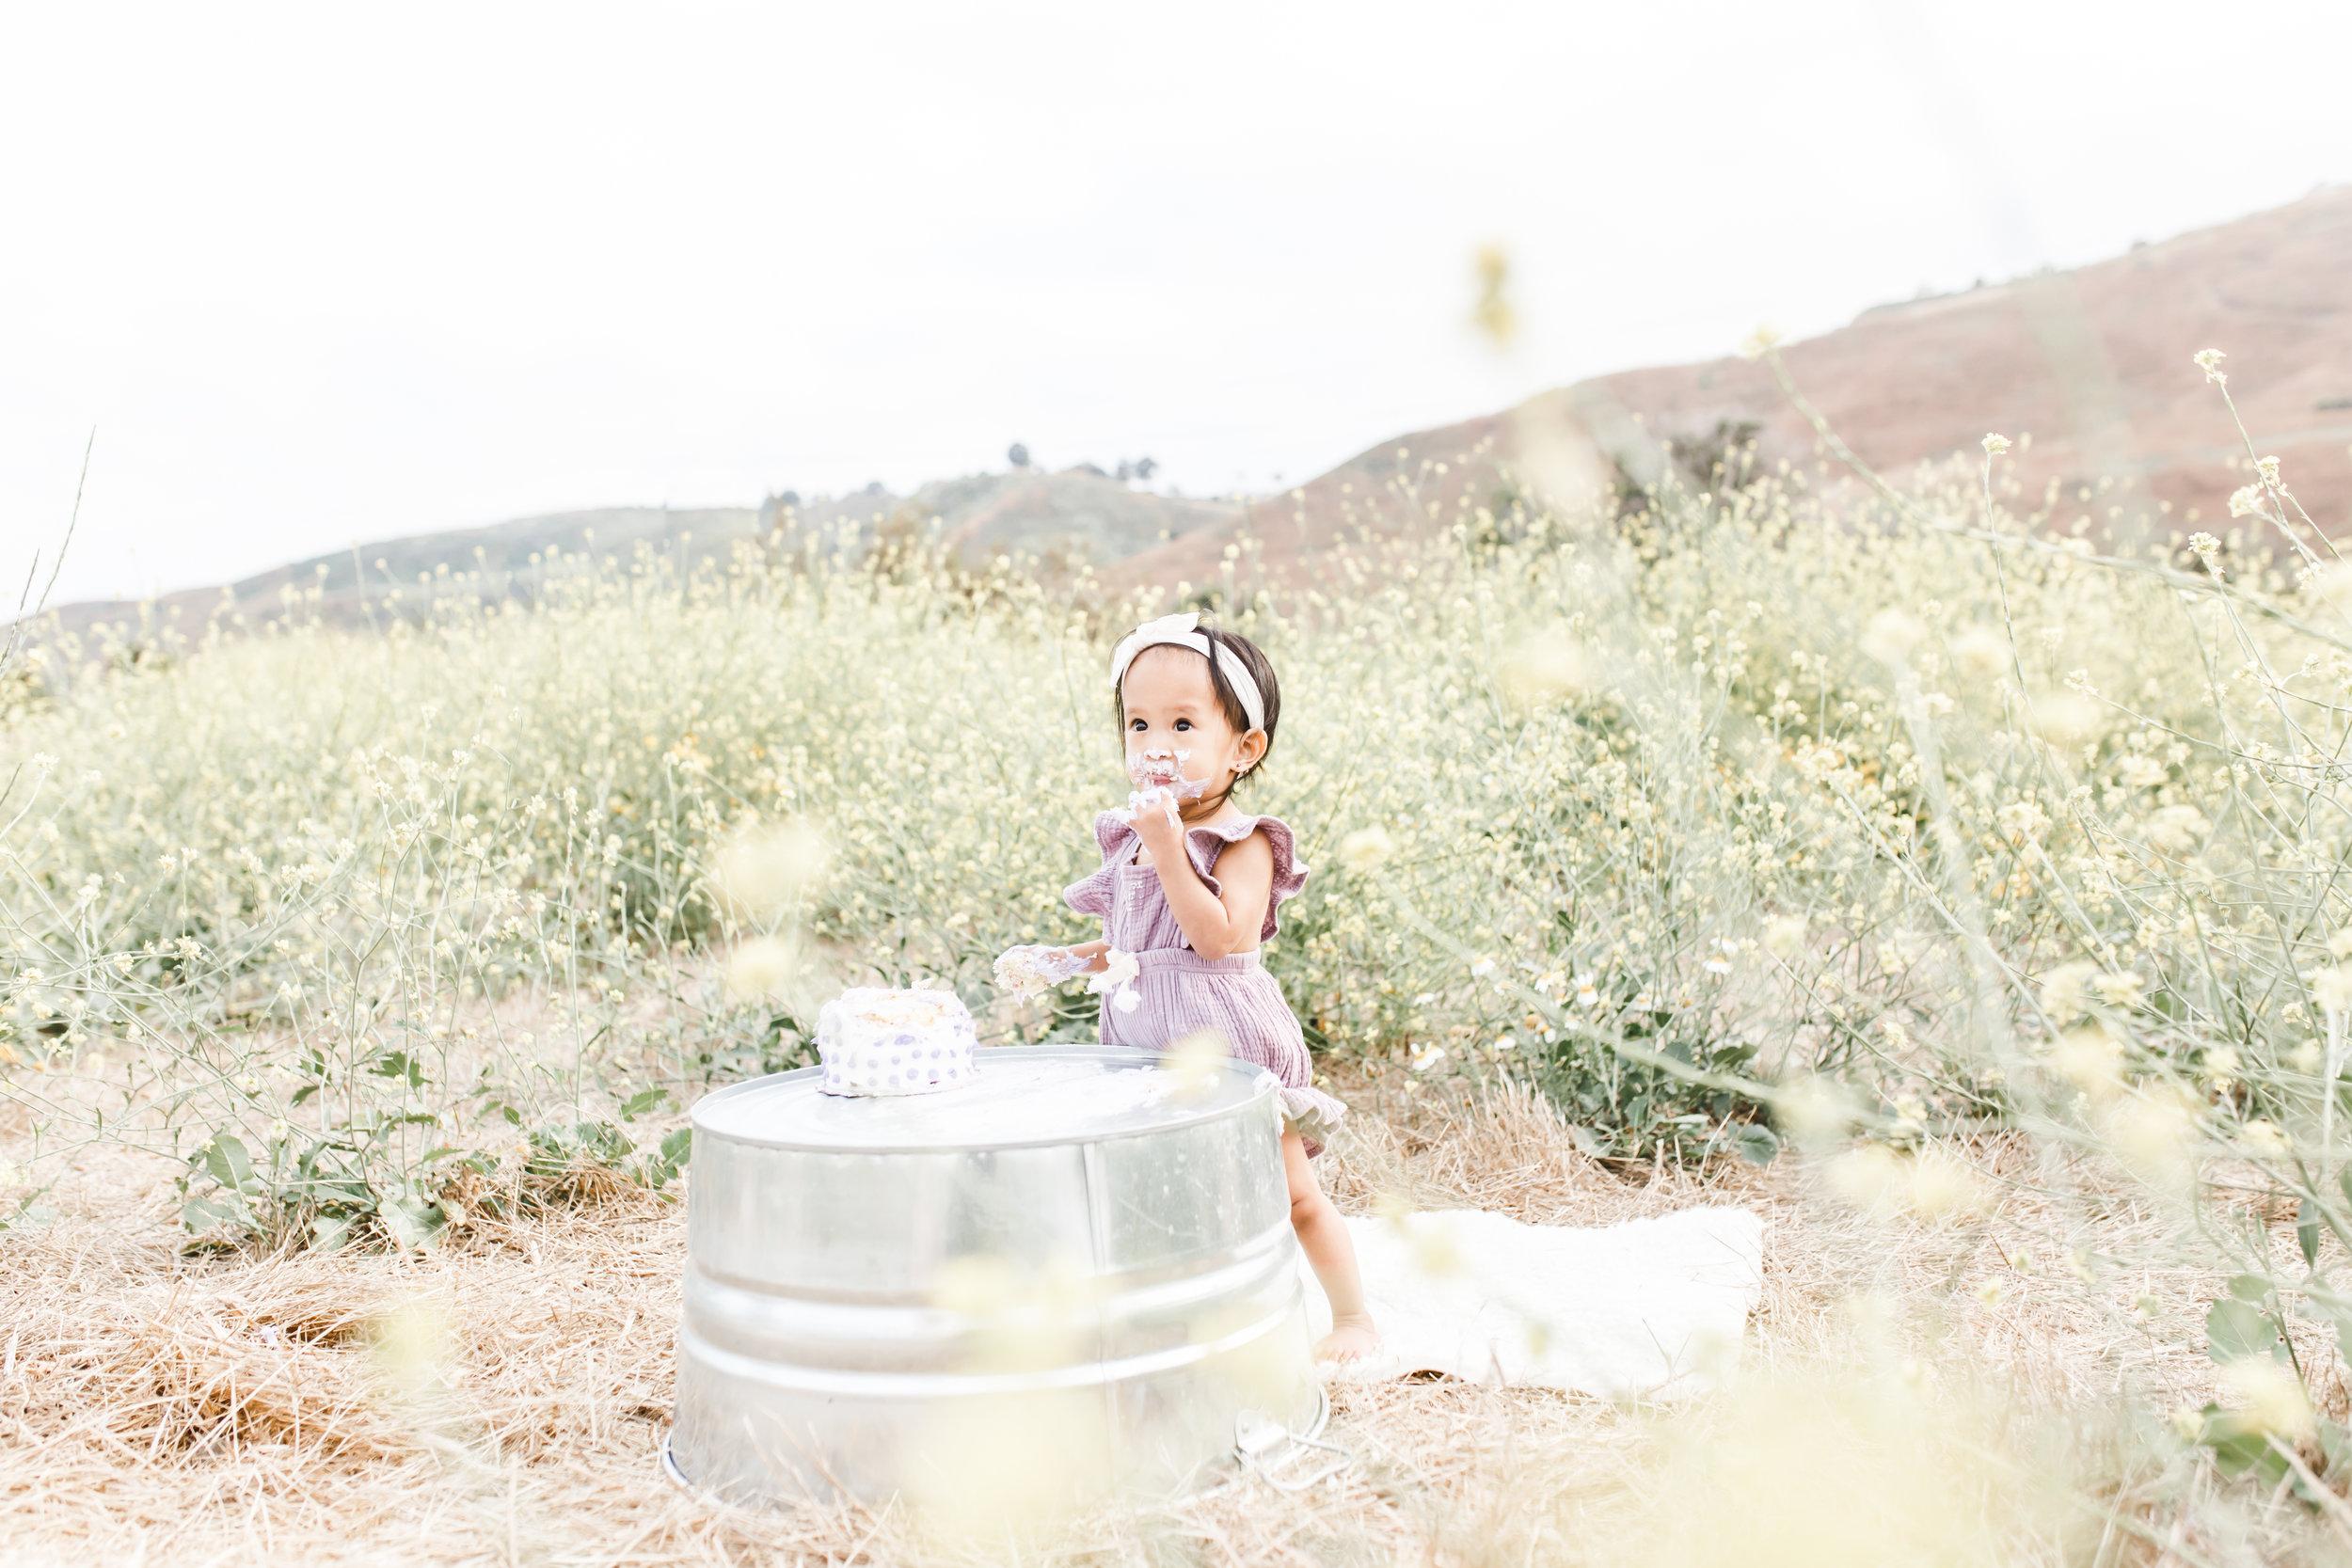 Dana PointInfant Photographer  ||  Field Cake Smash 1st birthday